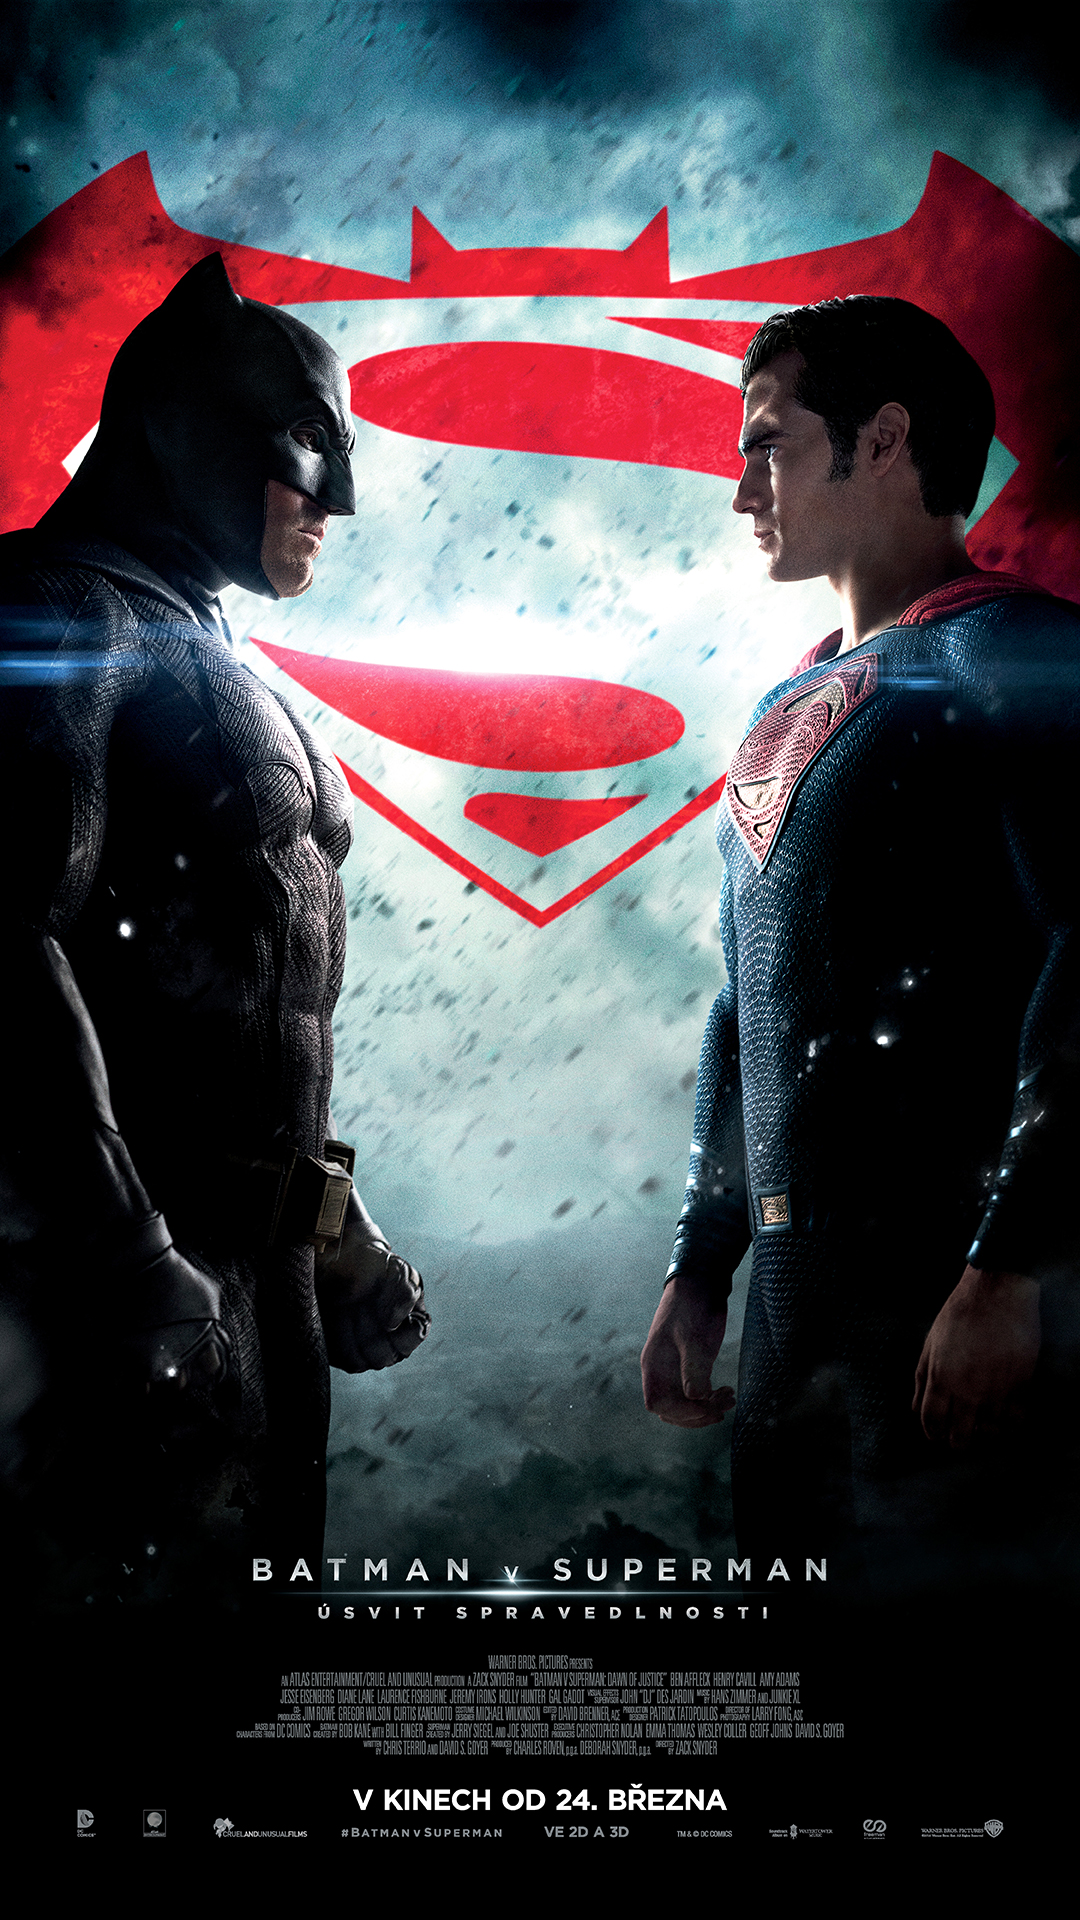 Batman v Superman SD Úsvit spravedlnosti (2016)